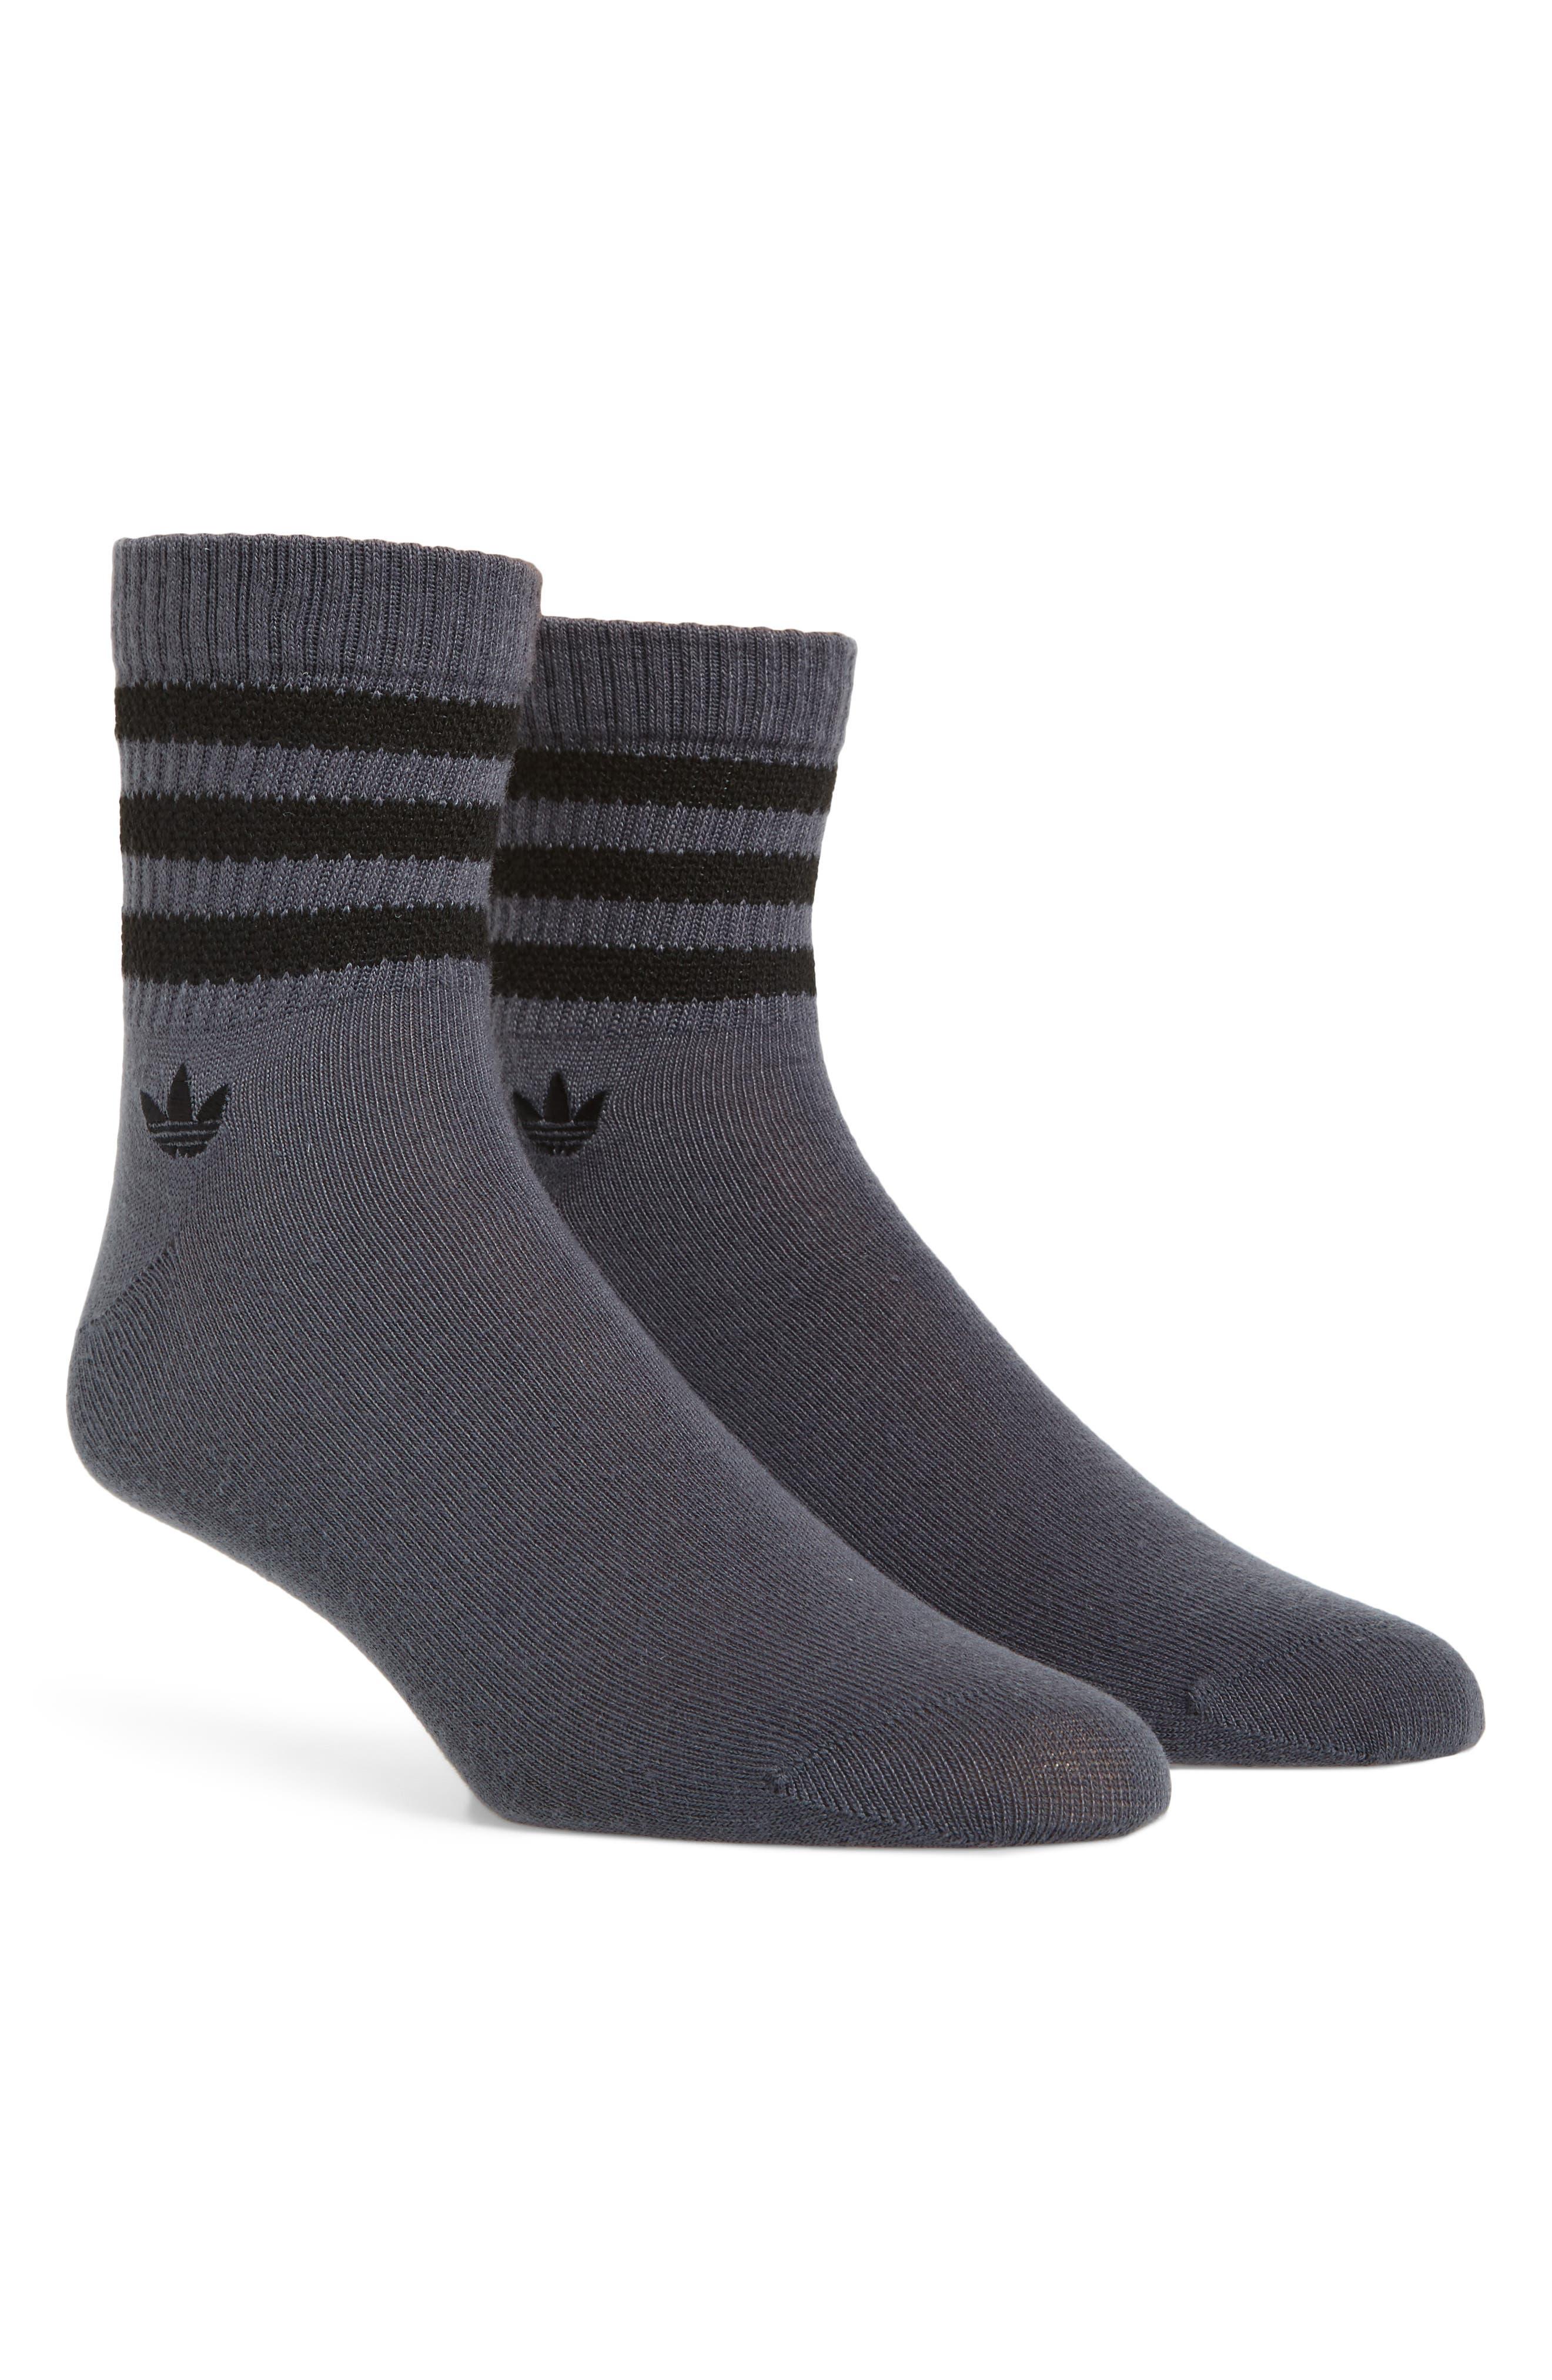 Textured 3-Stripes Crew Socks,                             Main thumbnail 1, color,                             Onyx/ Black